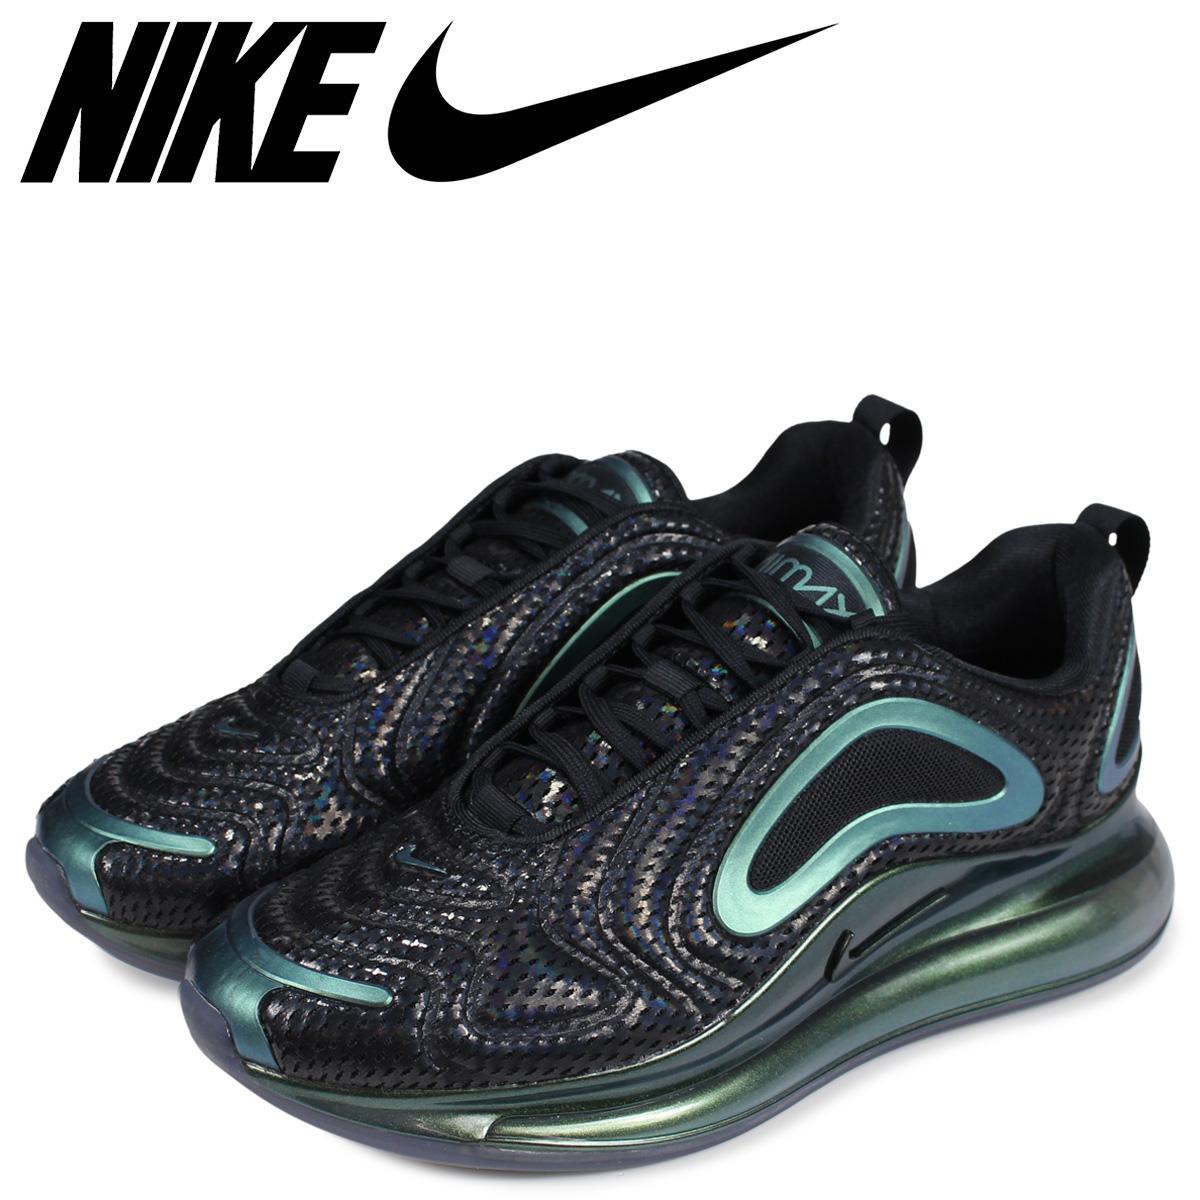 220877eba6 NIKE Kie Ney AMAX 720 sneakers men AIR MAX 720 black black AO2924-003 ...